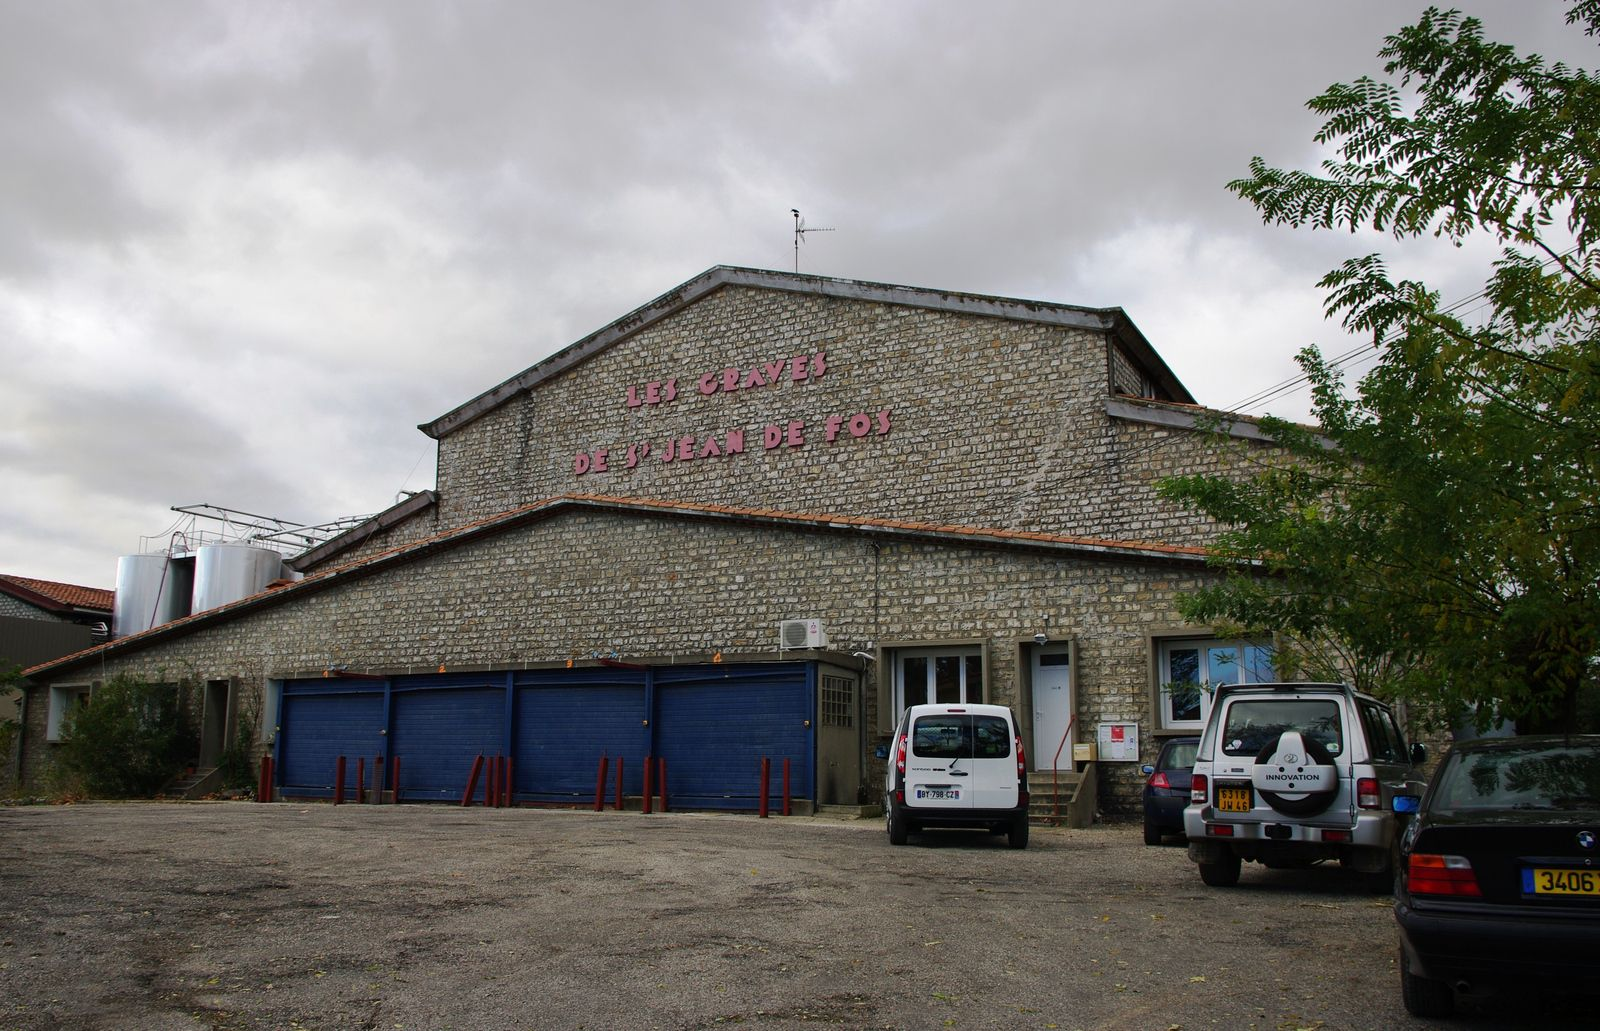 Cave coopérative de Saint-Jean-de-Fos.